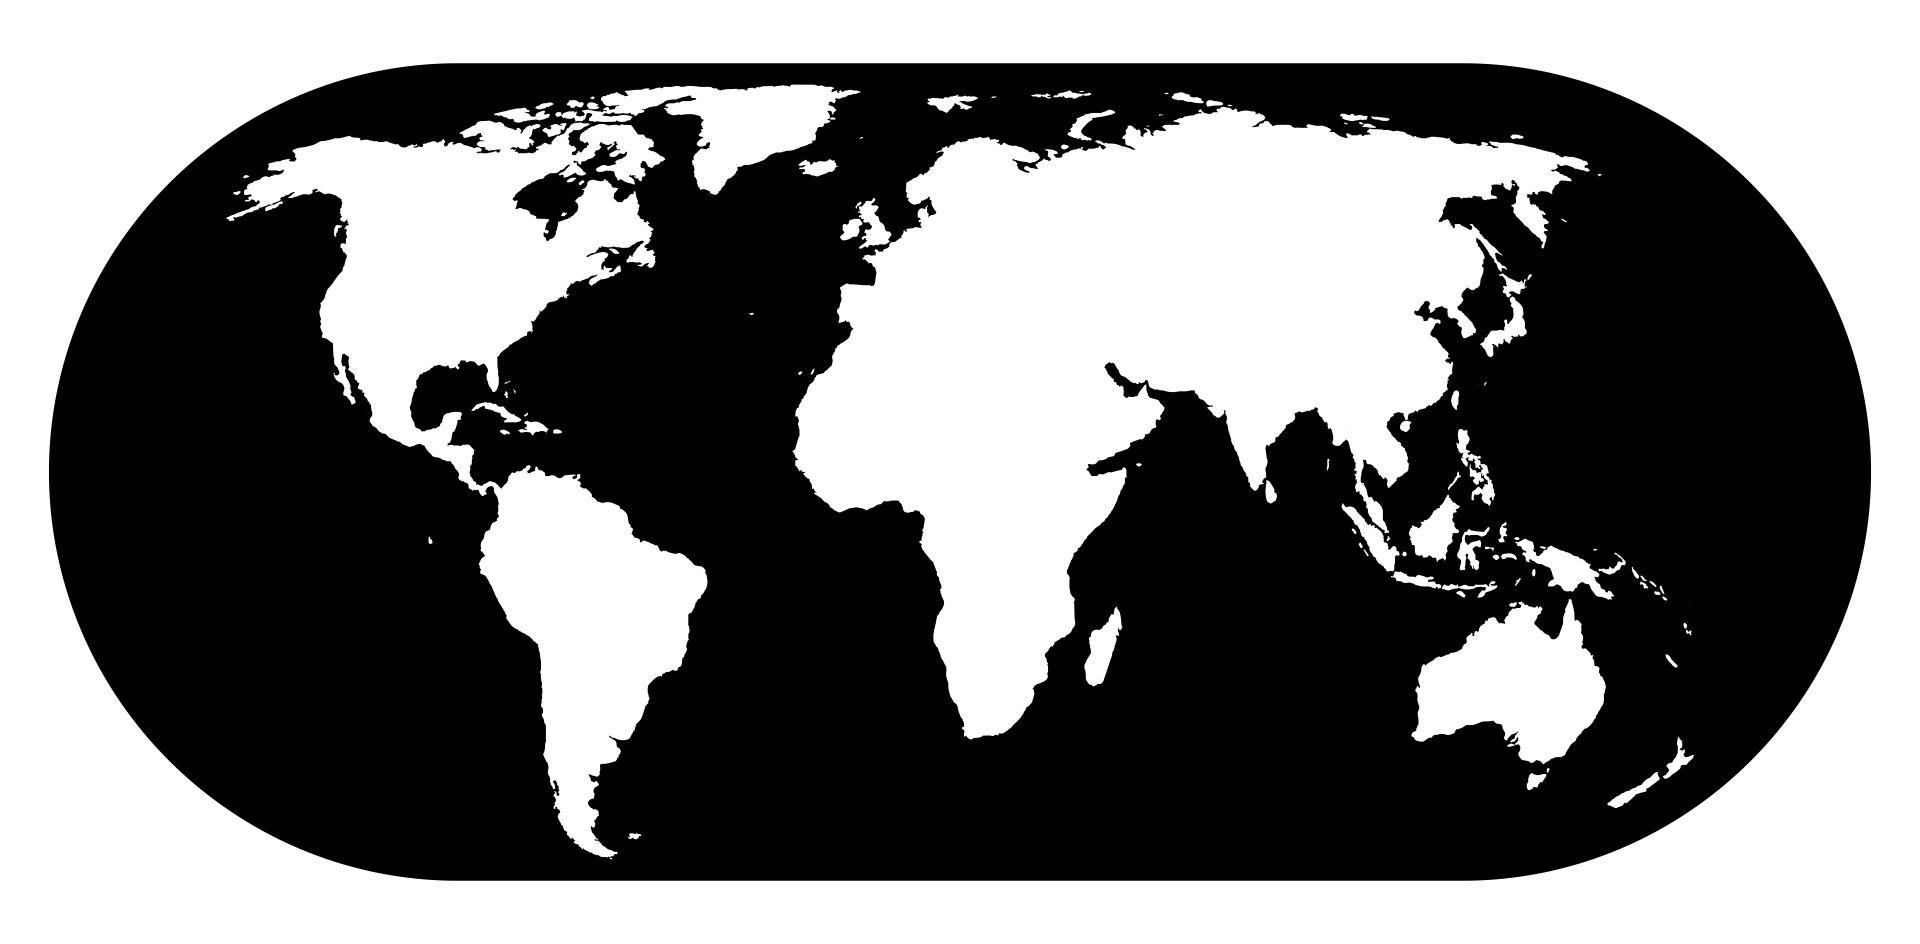 World Map Black And White Printable 6 Best Black And White World Map Printable   printablee.com